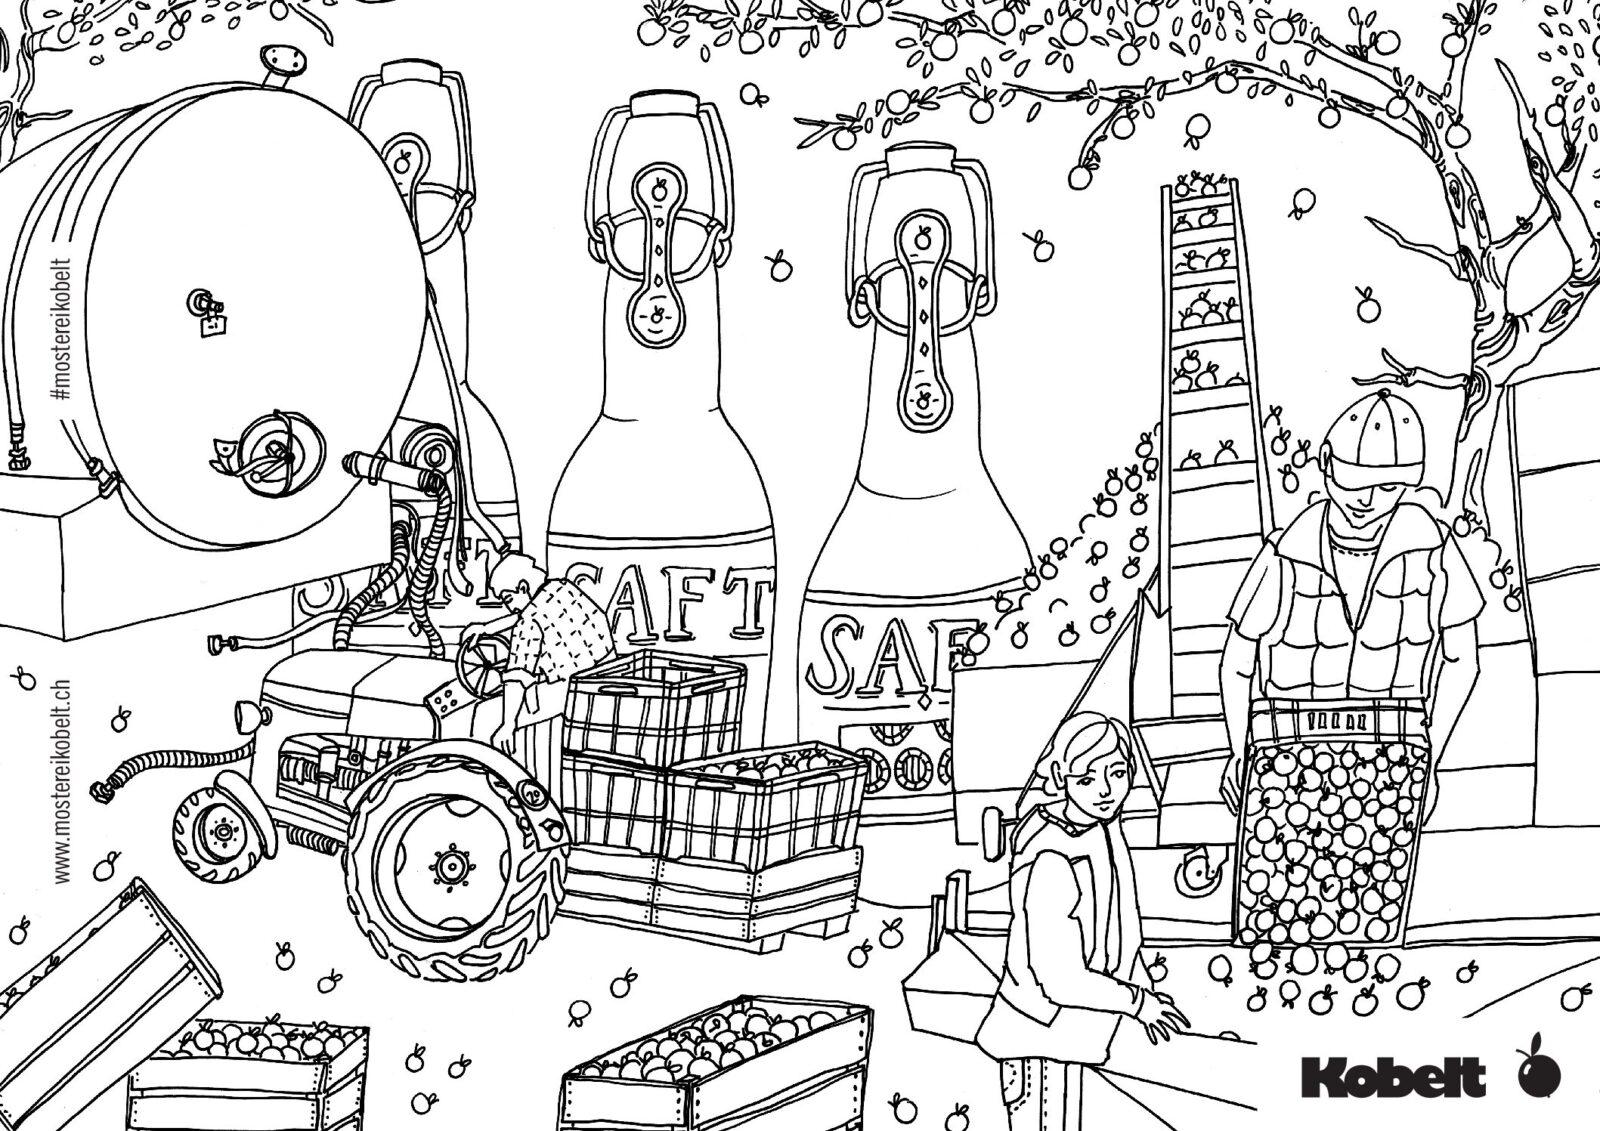 Mosterei-Kobelt-Ausmalbild-Obstannahme-2020-pdf-1600x1131